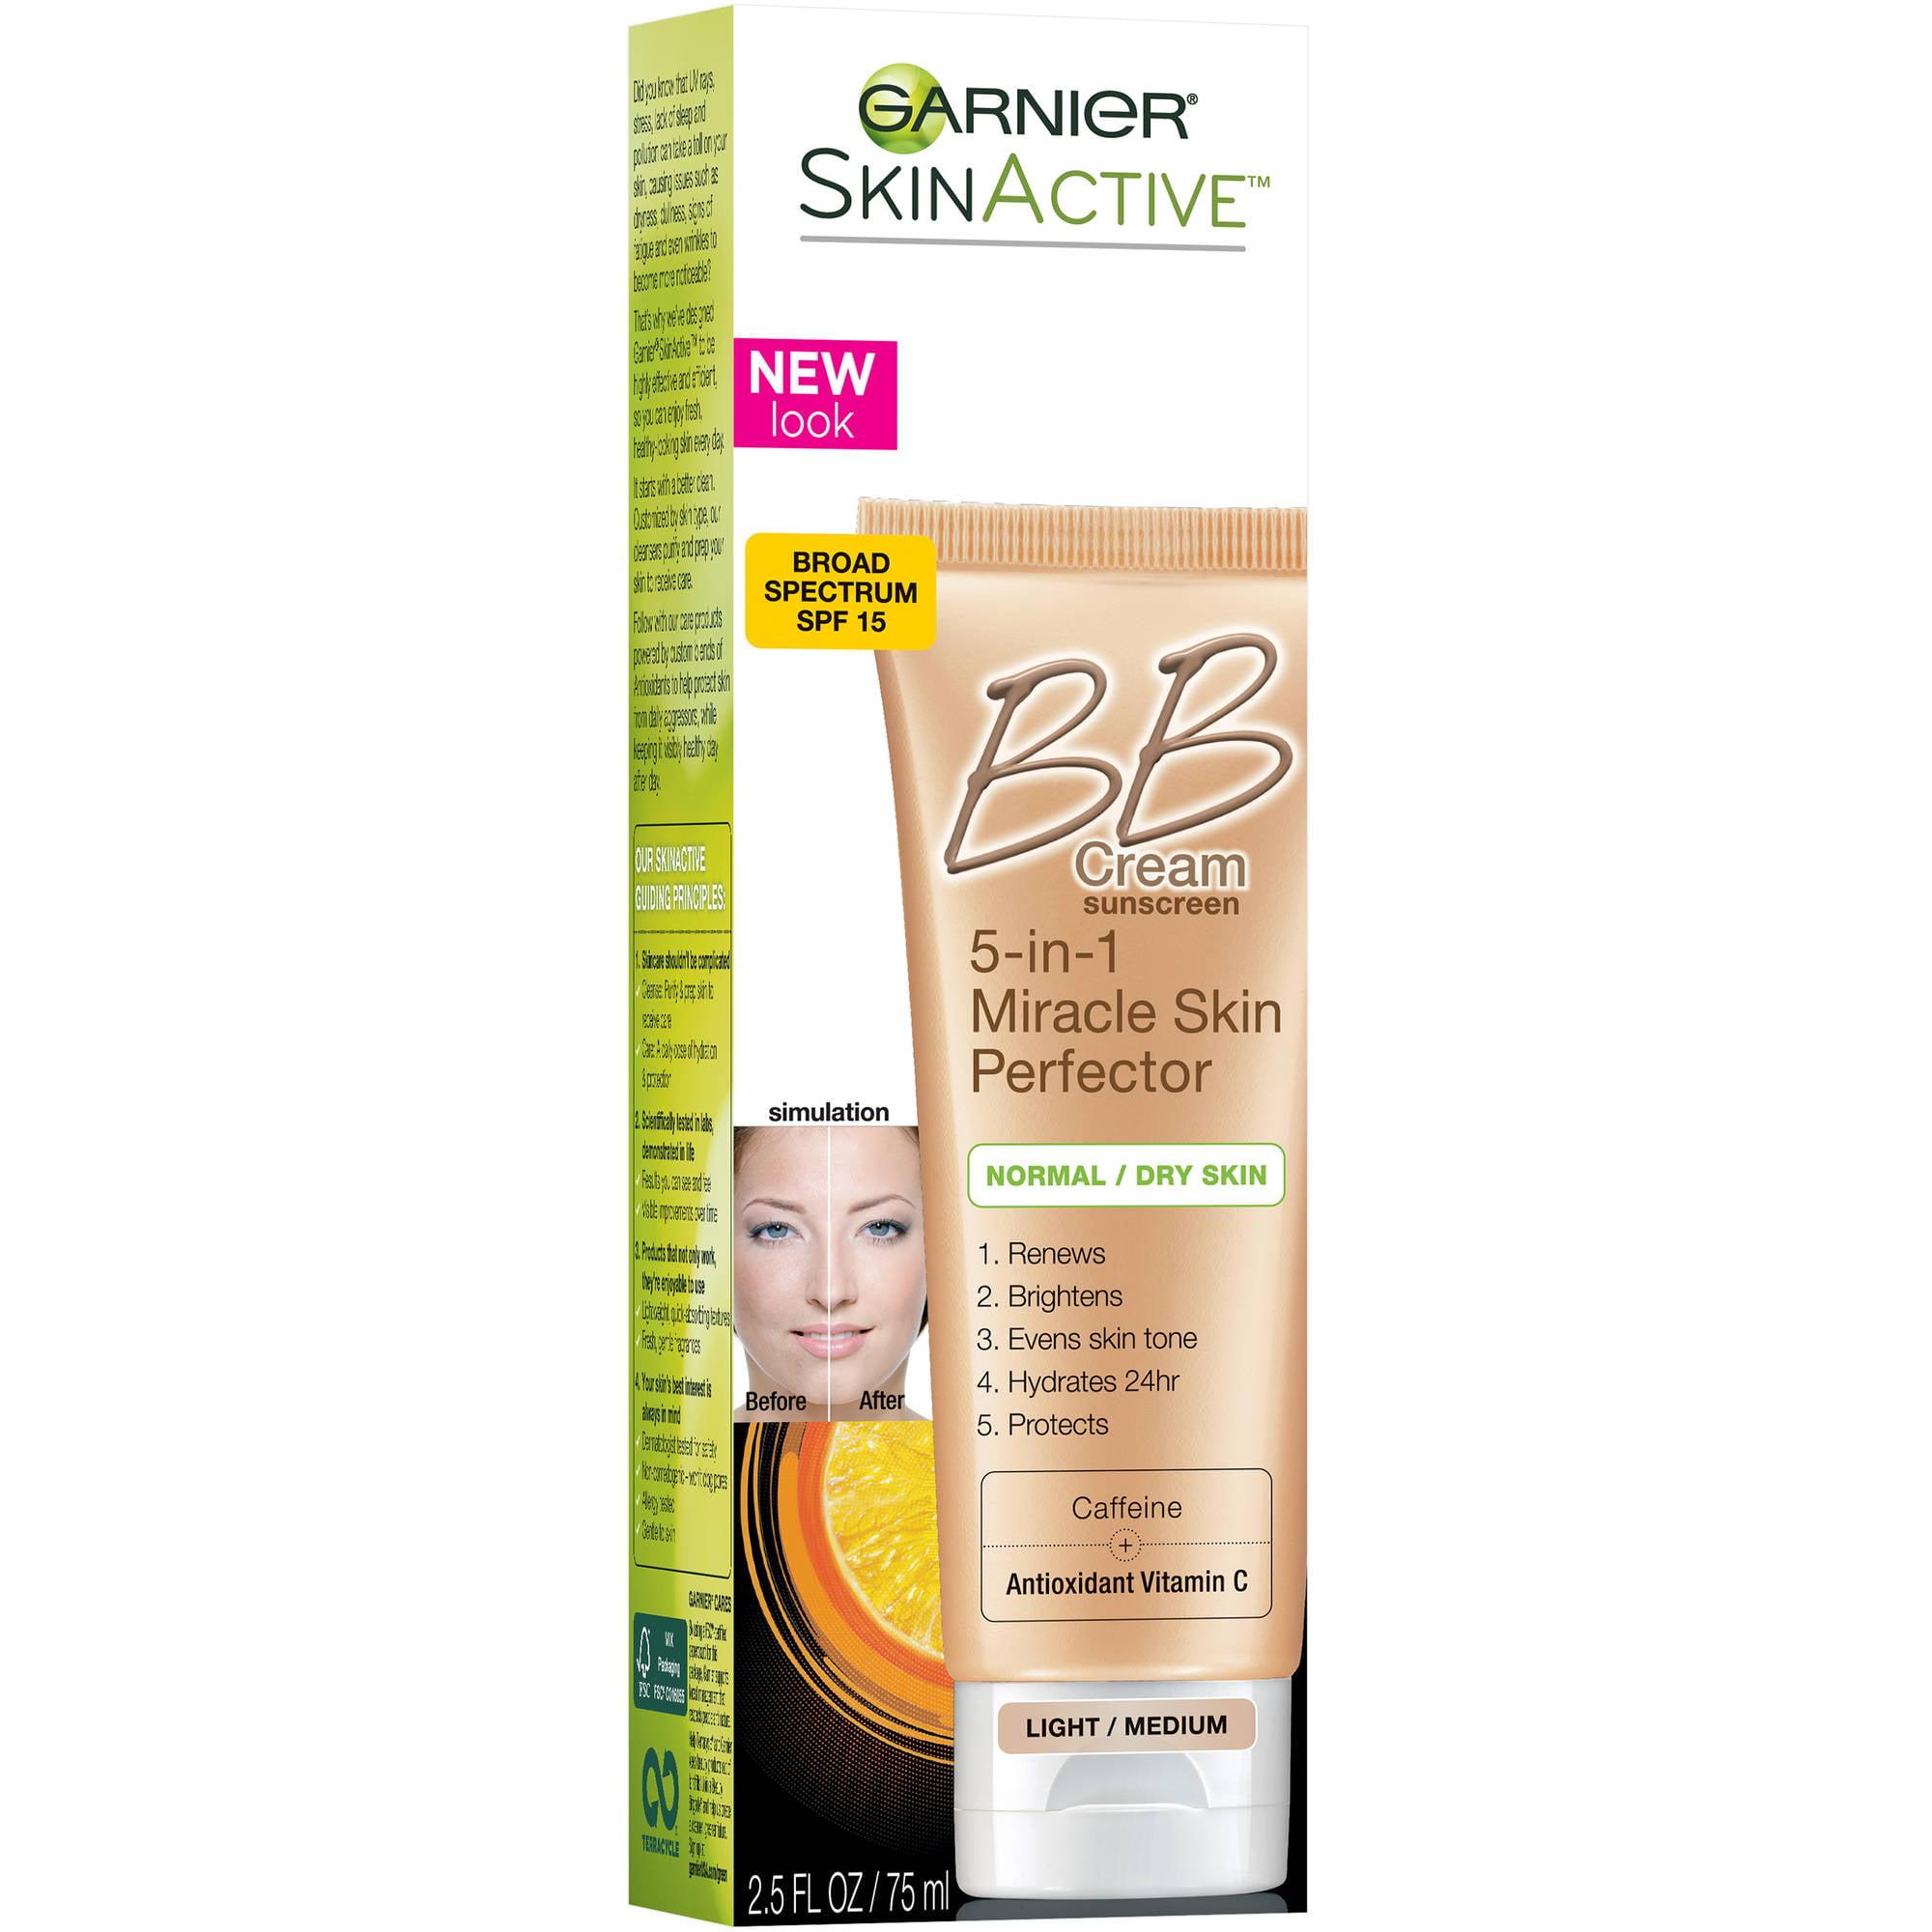 Garnier SkinActive Skin Perfector BB Cream for Normal & Dry Skin